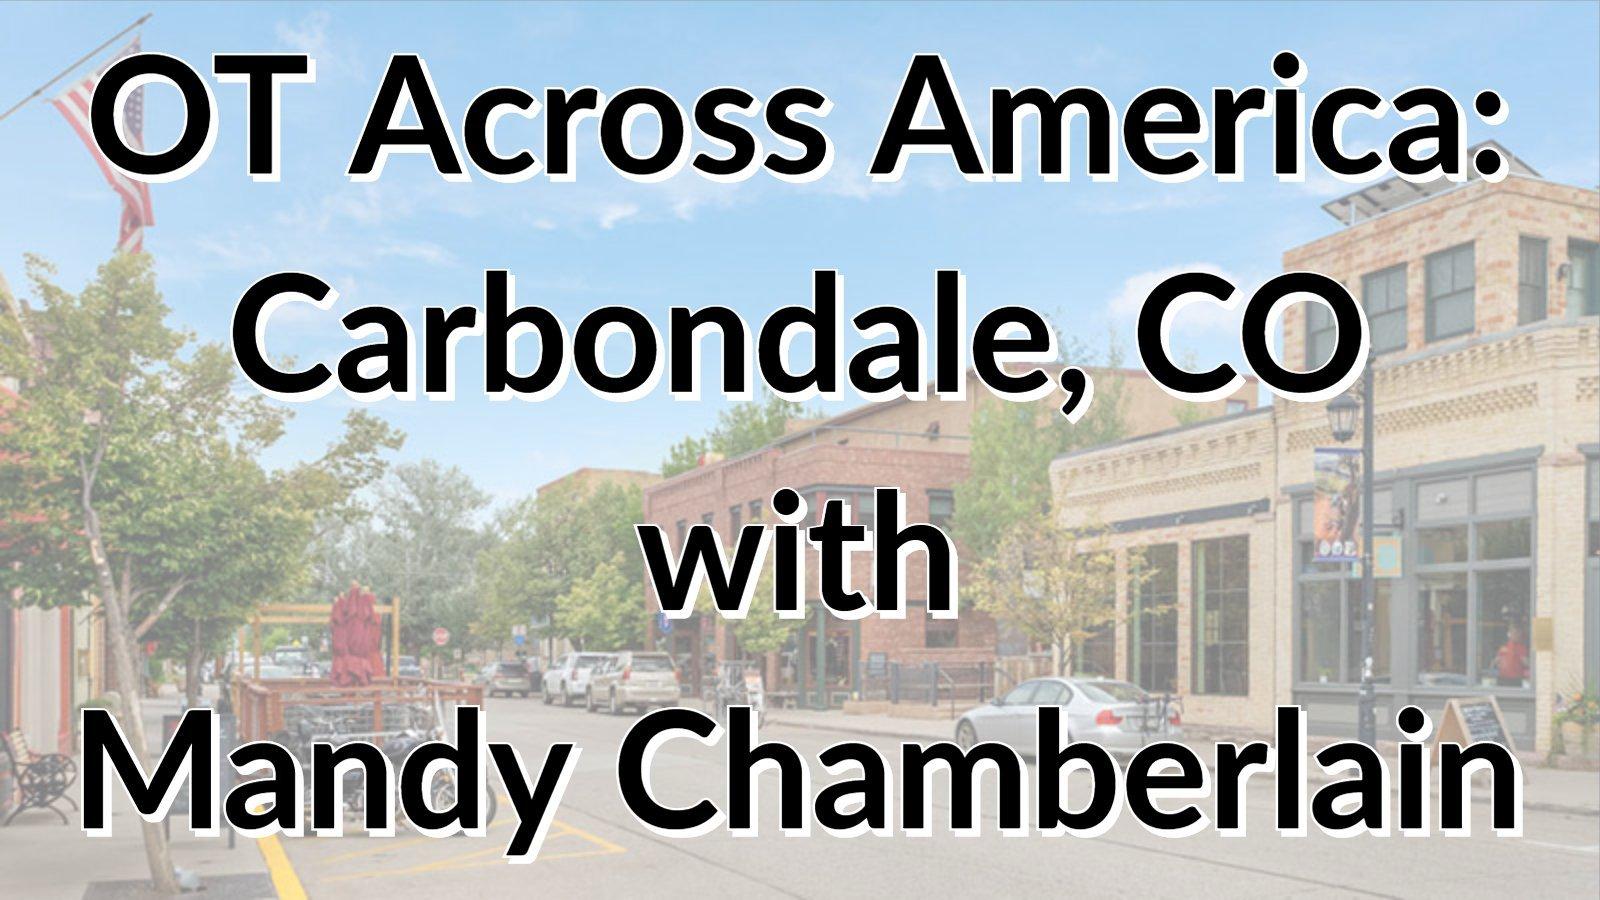 carbondale-mandy-chamberlain-main